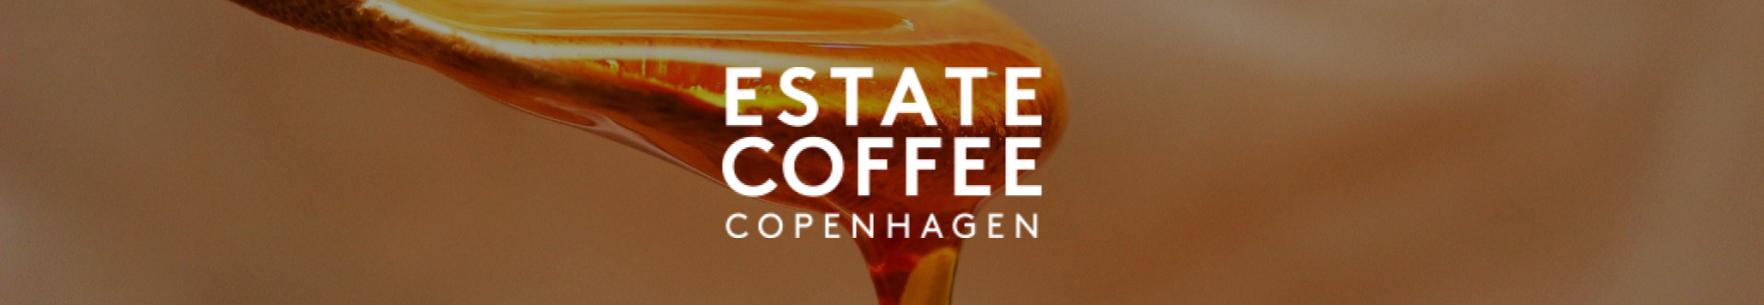 Kaffesirup fra Estate Coffee